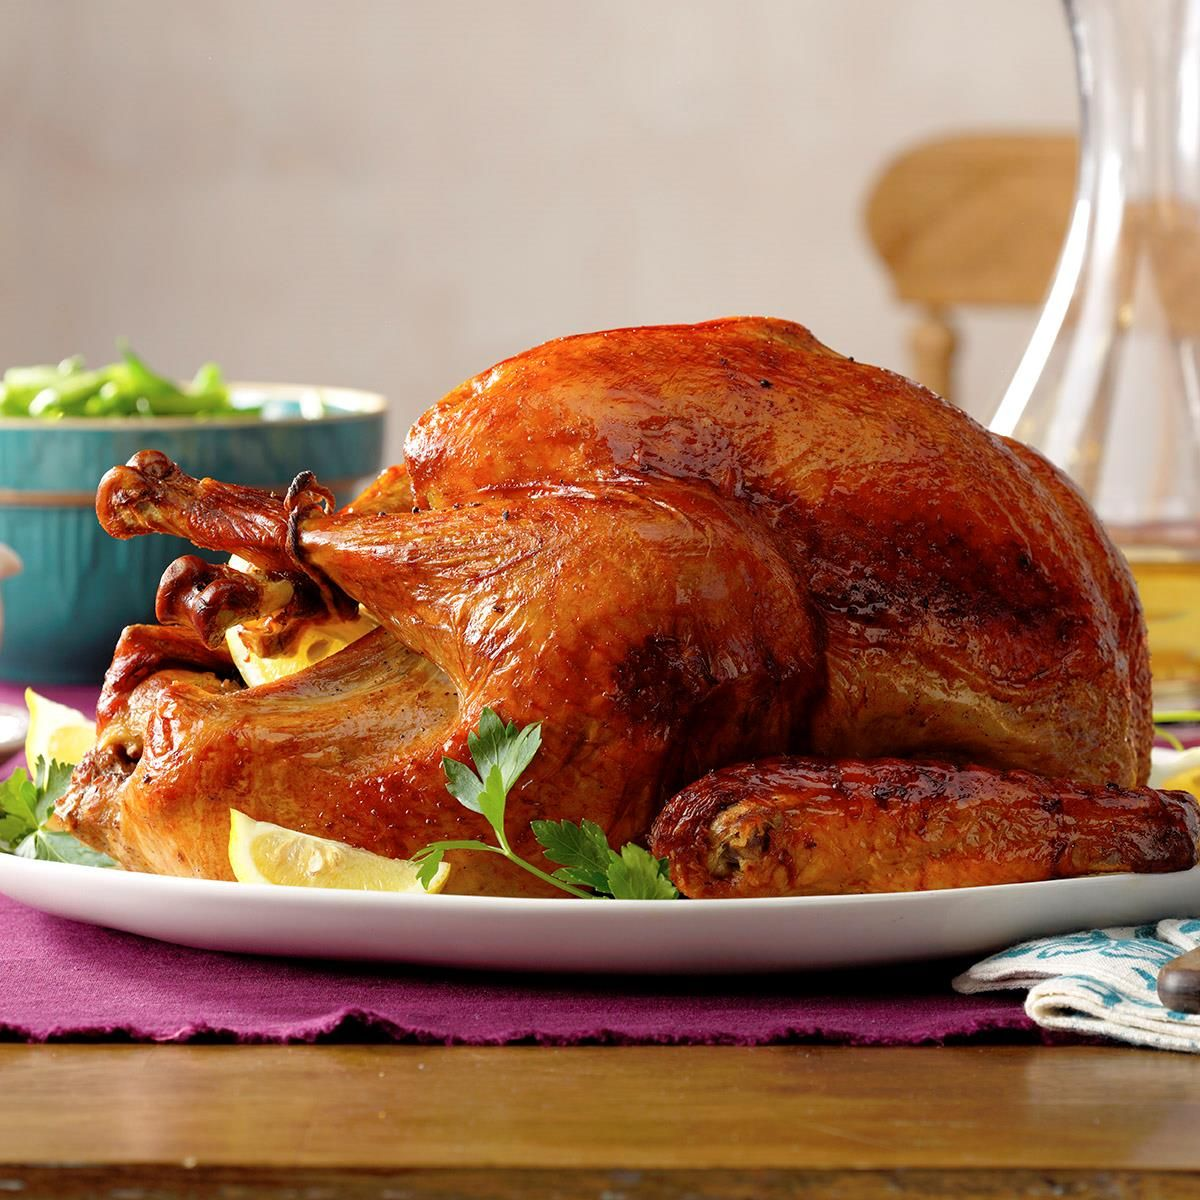 Marinated Thanksgiving Turkey Recipe Thanksgiving Dinner Menu Recipes Thanksgiving Recipes